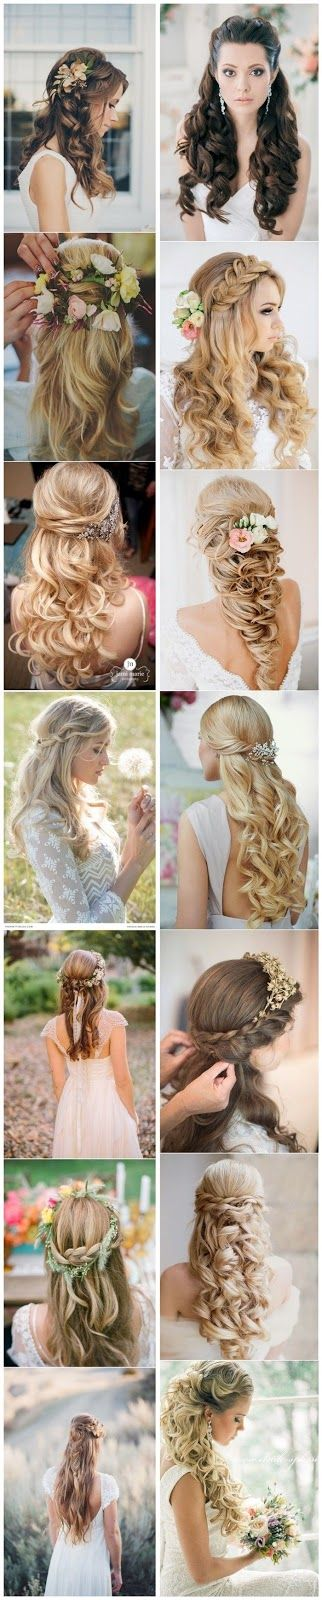 Awesome HairStyles  http://myawsomeoutfits.blogspot.pt/2015/07/15-stunning-half-up-half-down-wedding.html